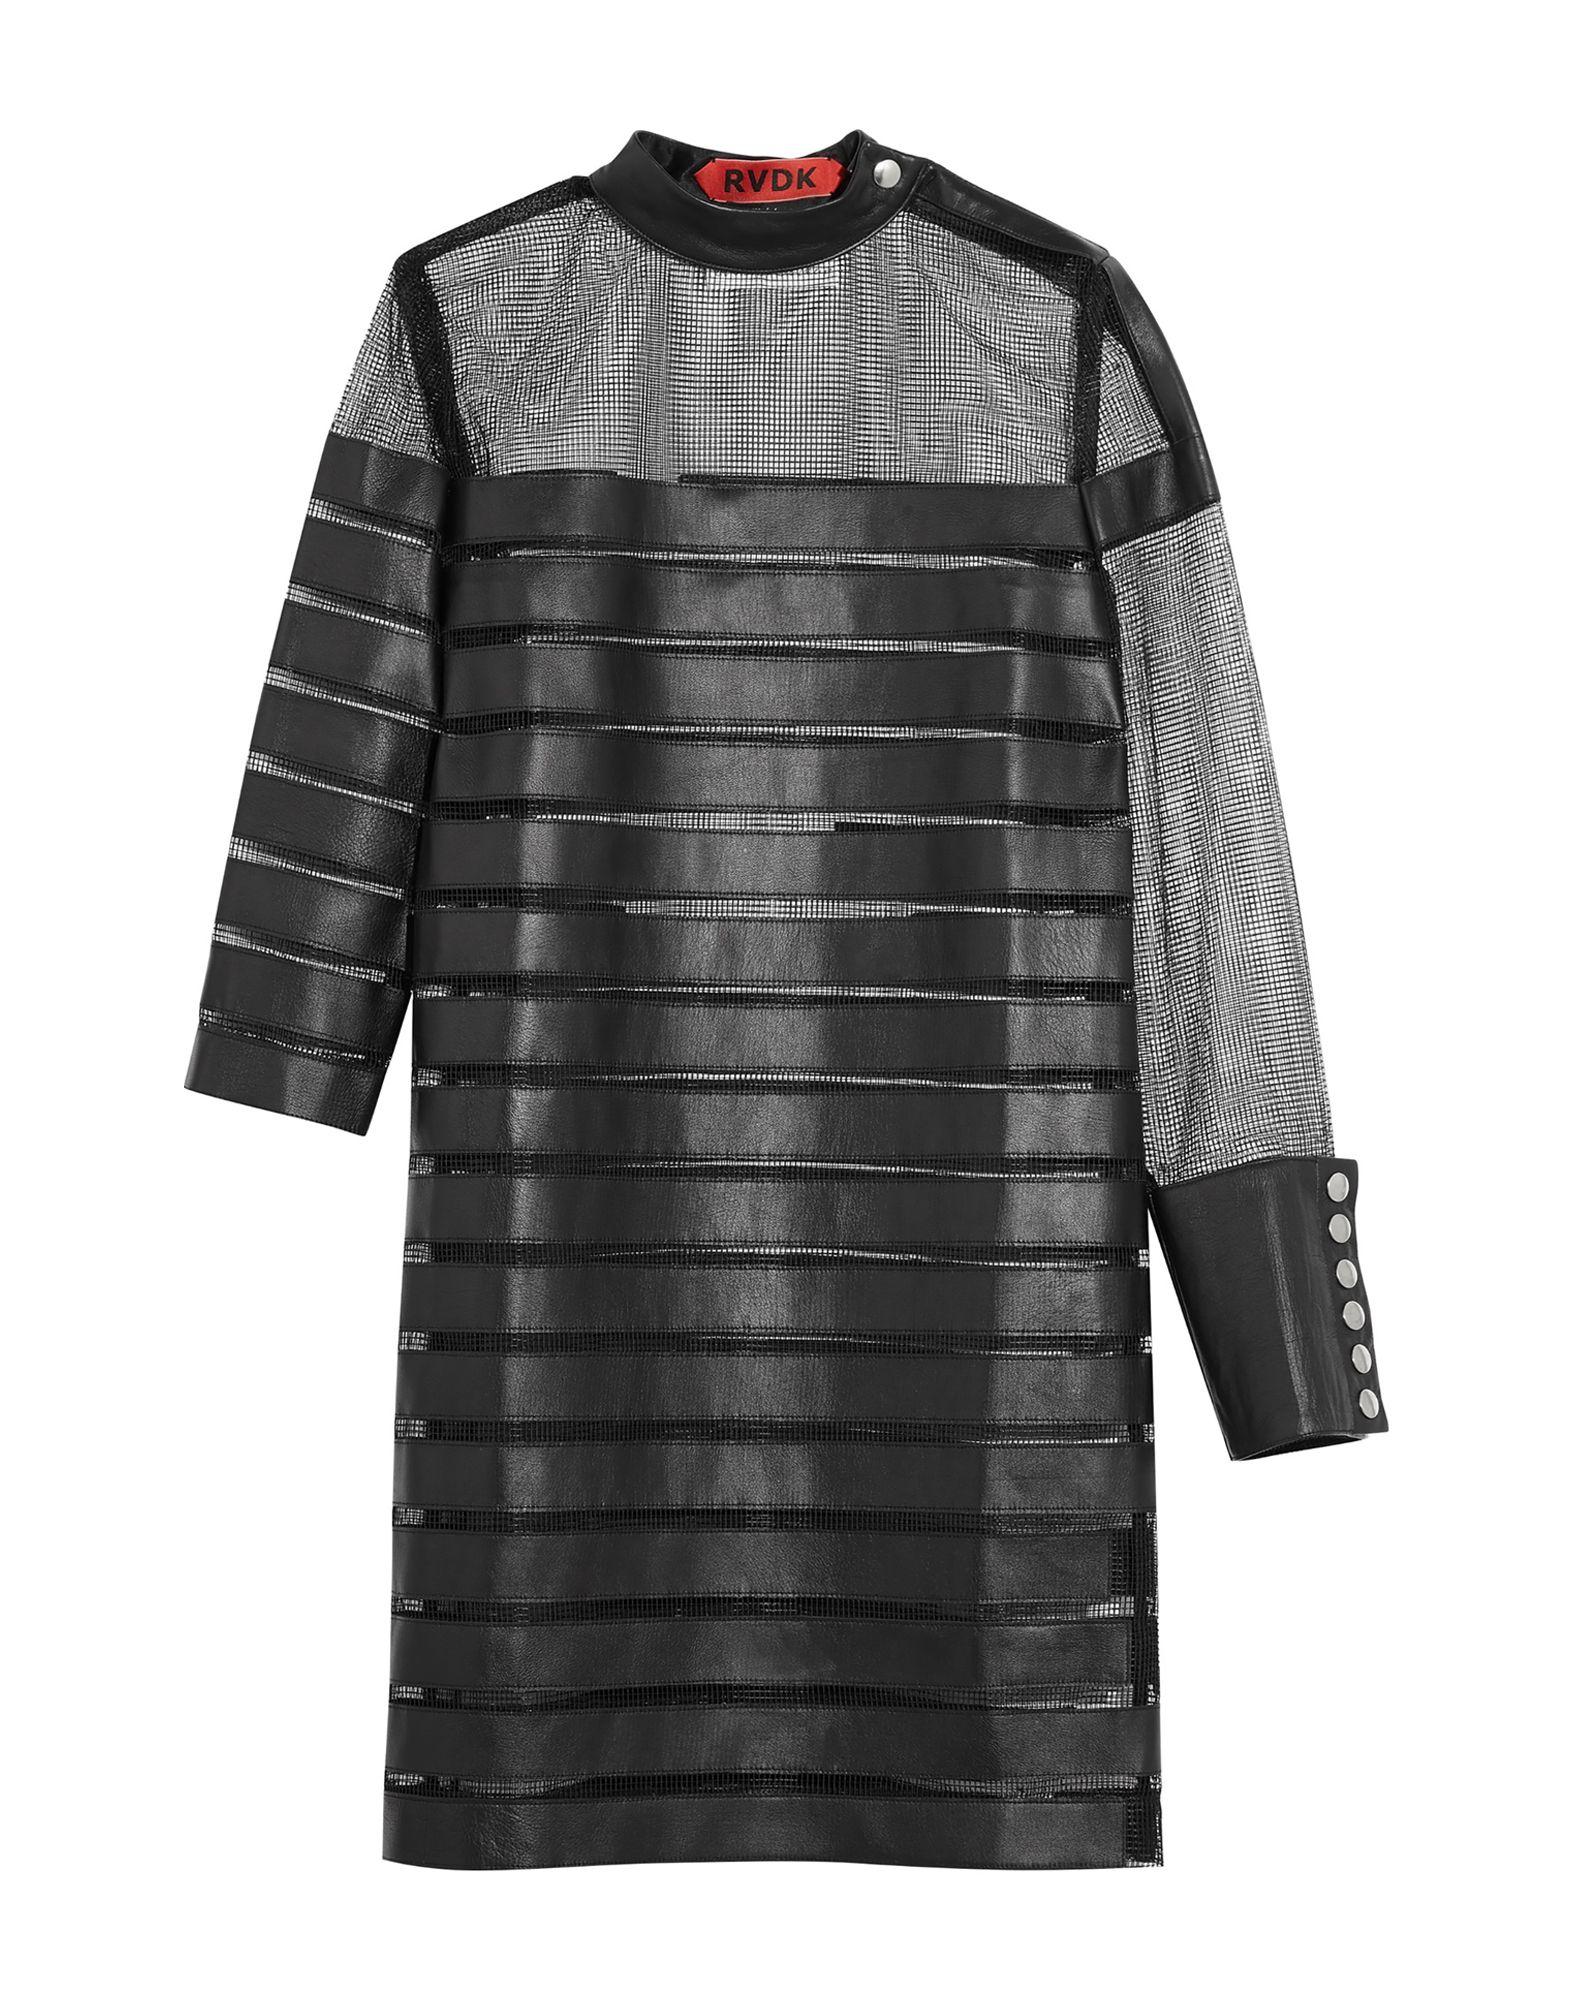 Фото - RONALD VAN DER KEMP Короткое платье v persie van basten 556688